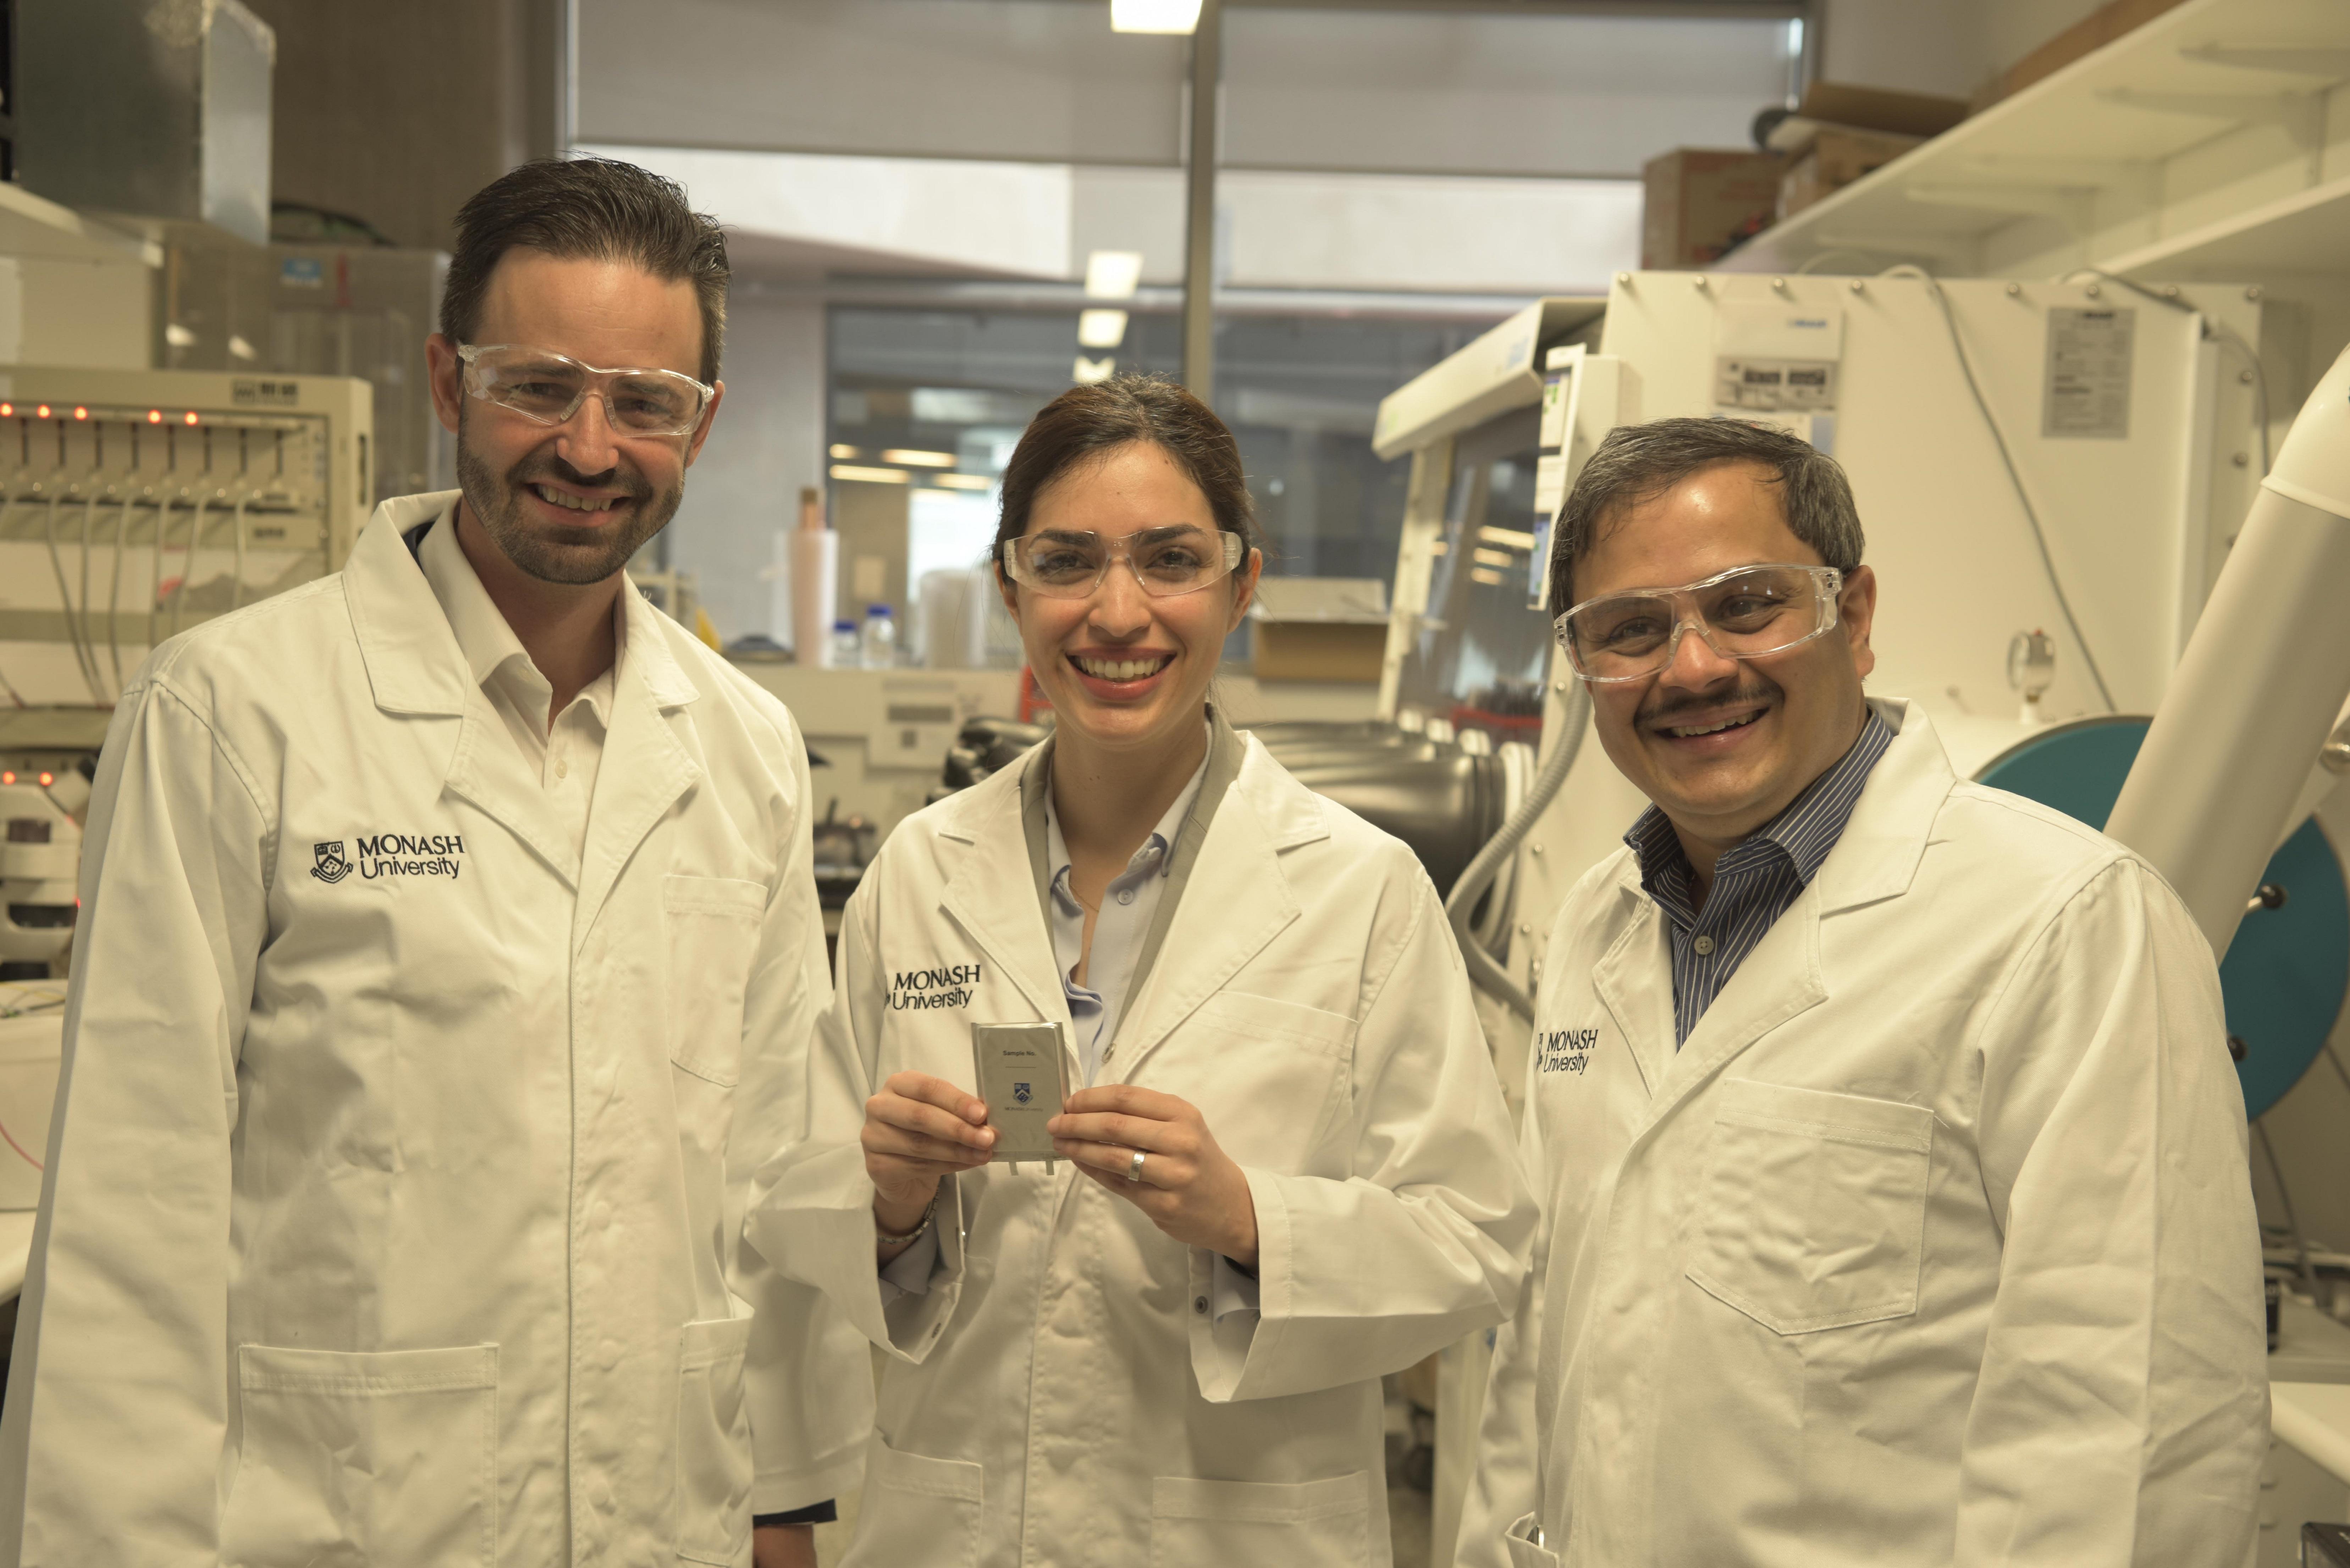 Professor Matthew Hill, Dr. Mahdokht Shaibani und Professor Mainak Majumder mit dem Prototyp. Fotocredit: © Monash University